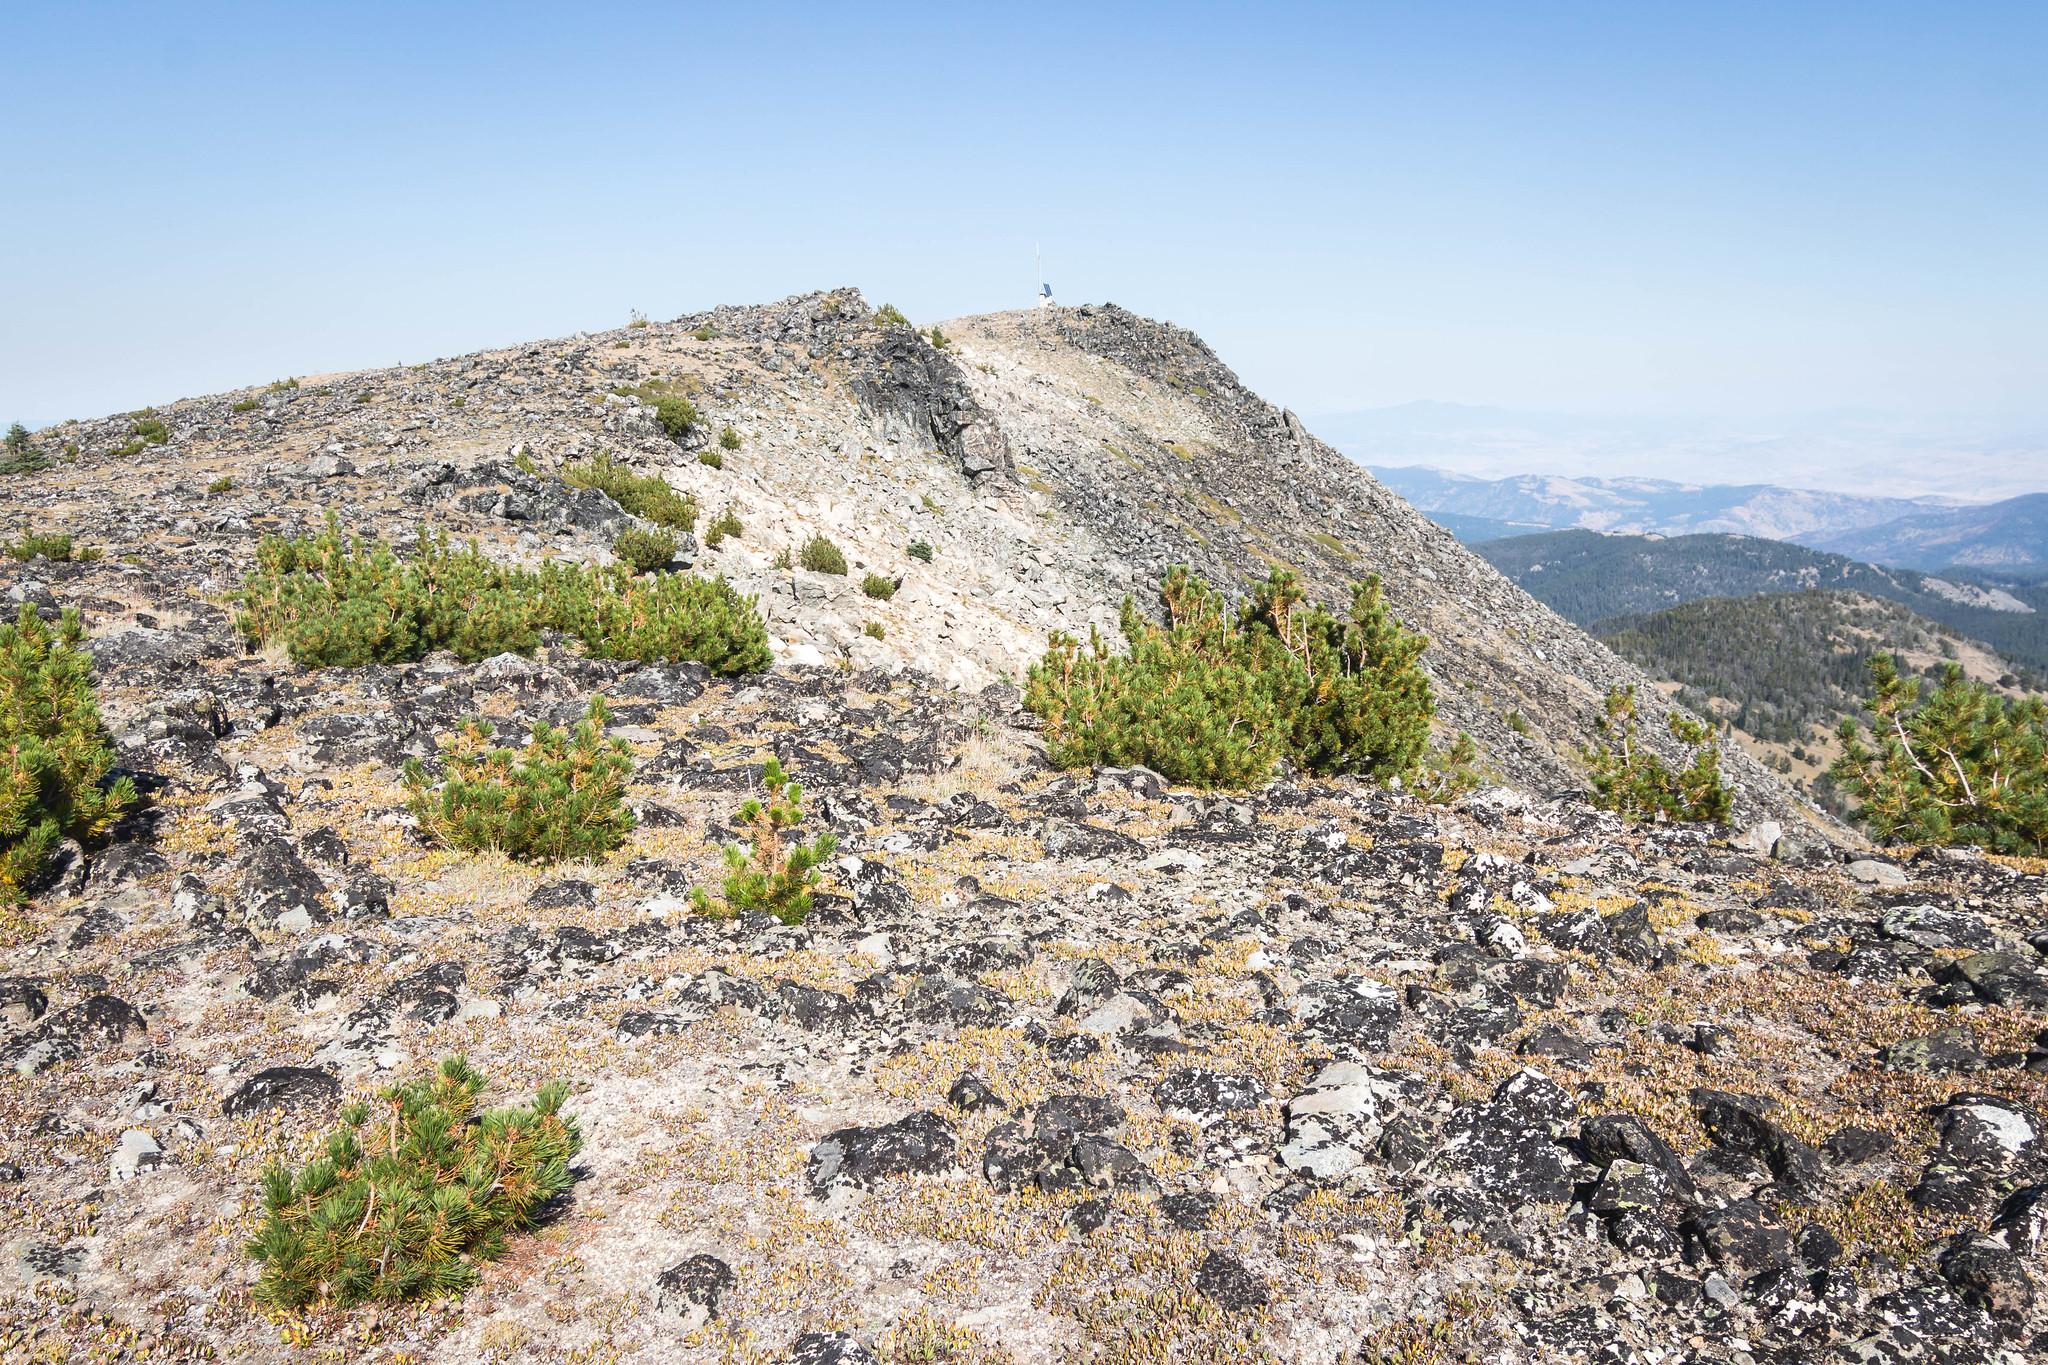 Rock Mountaoin summit ahead